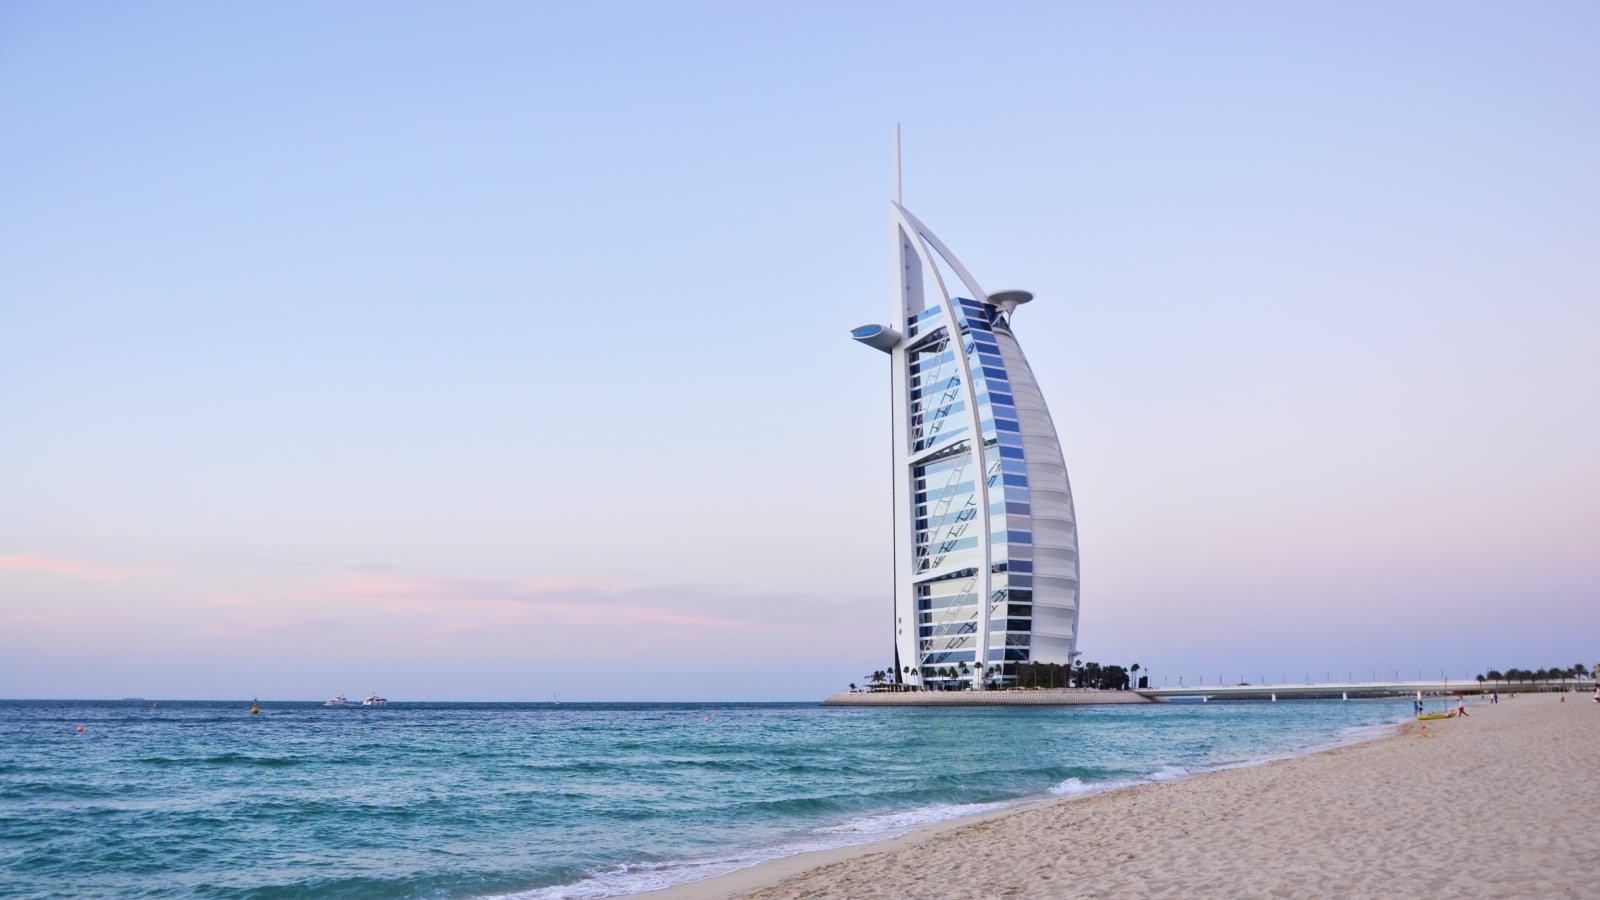 Lit Quotes Wallpaper 20 Very Beautiful Burj Al Arab Dubai Pictures And Images